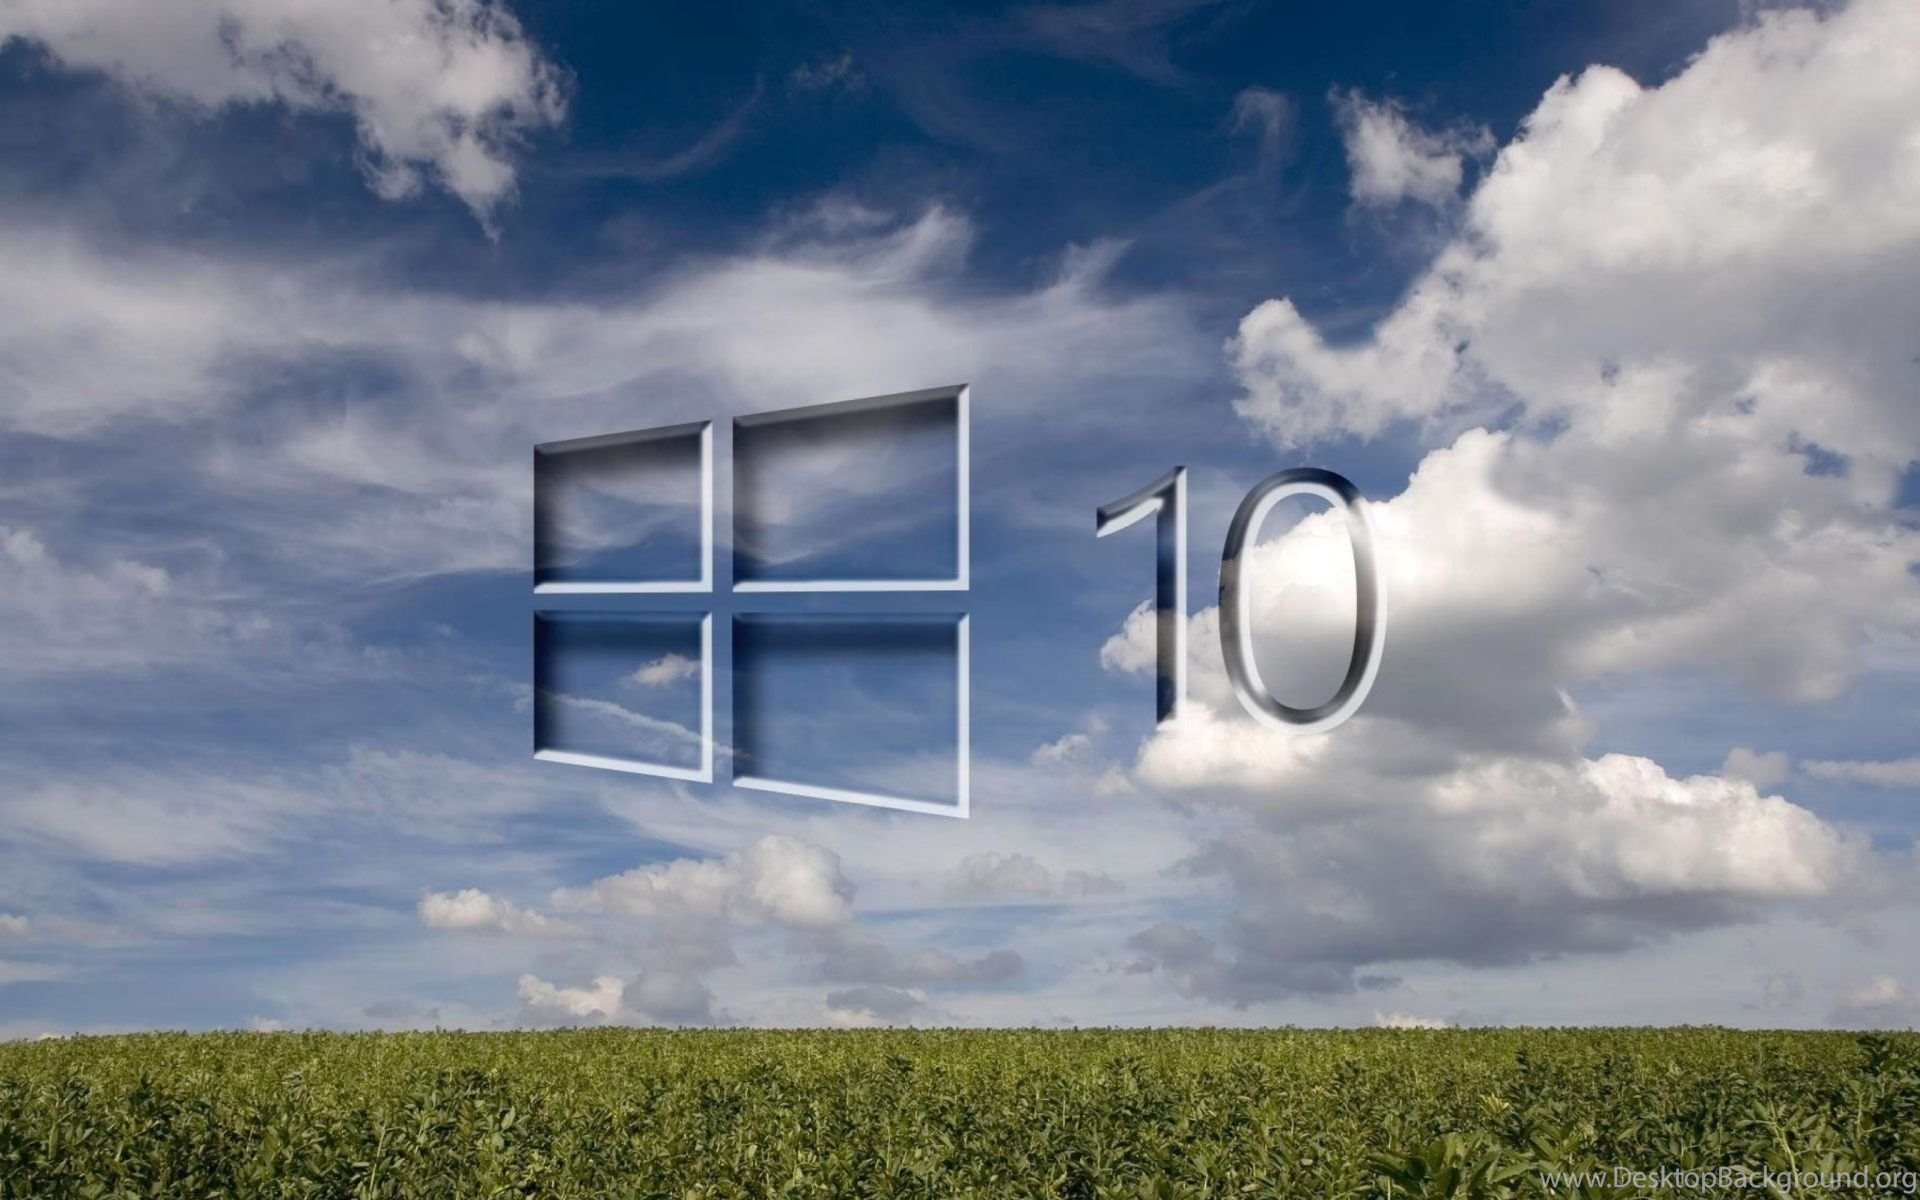 Windows 10 Grass Field 1920x1200 Jpg Desktop Background